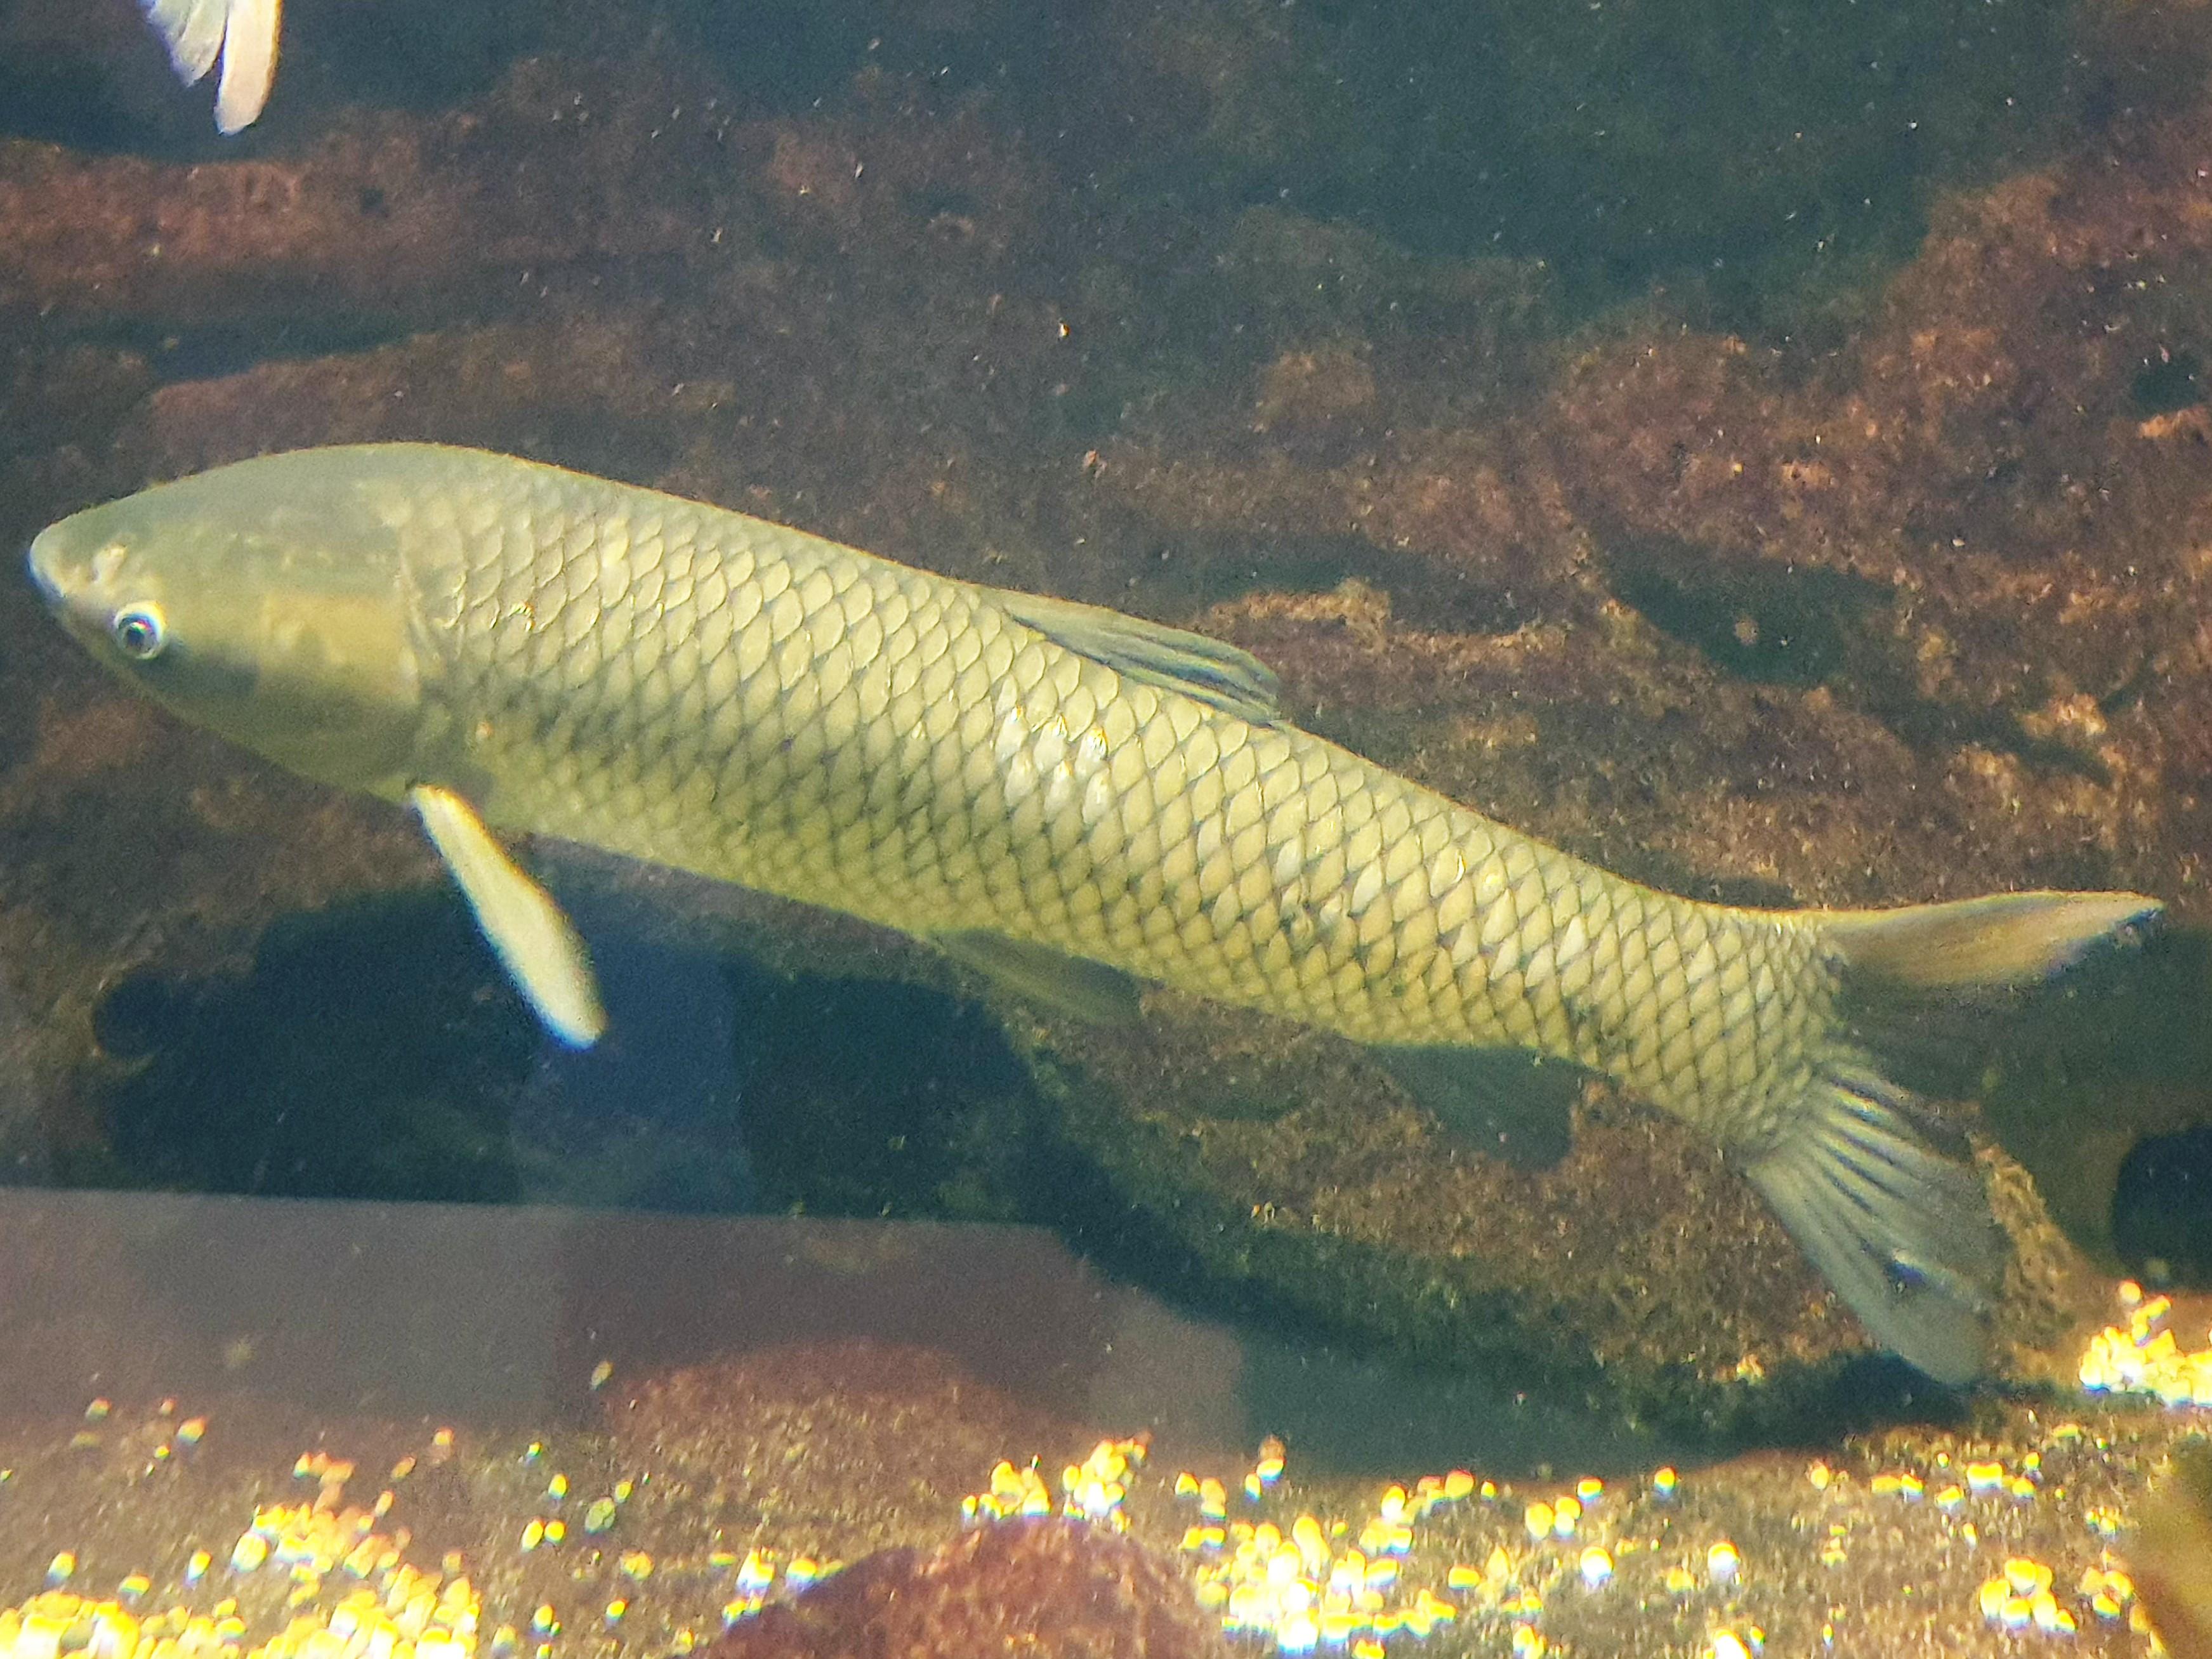 File:Hal - Ctenopharyngodon idella - 1.jpg - Wikimedia Commons